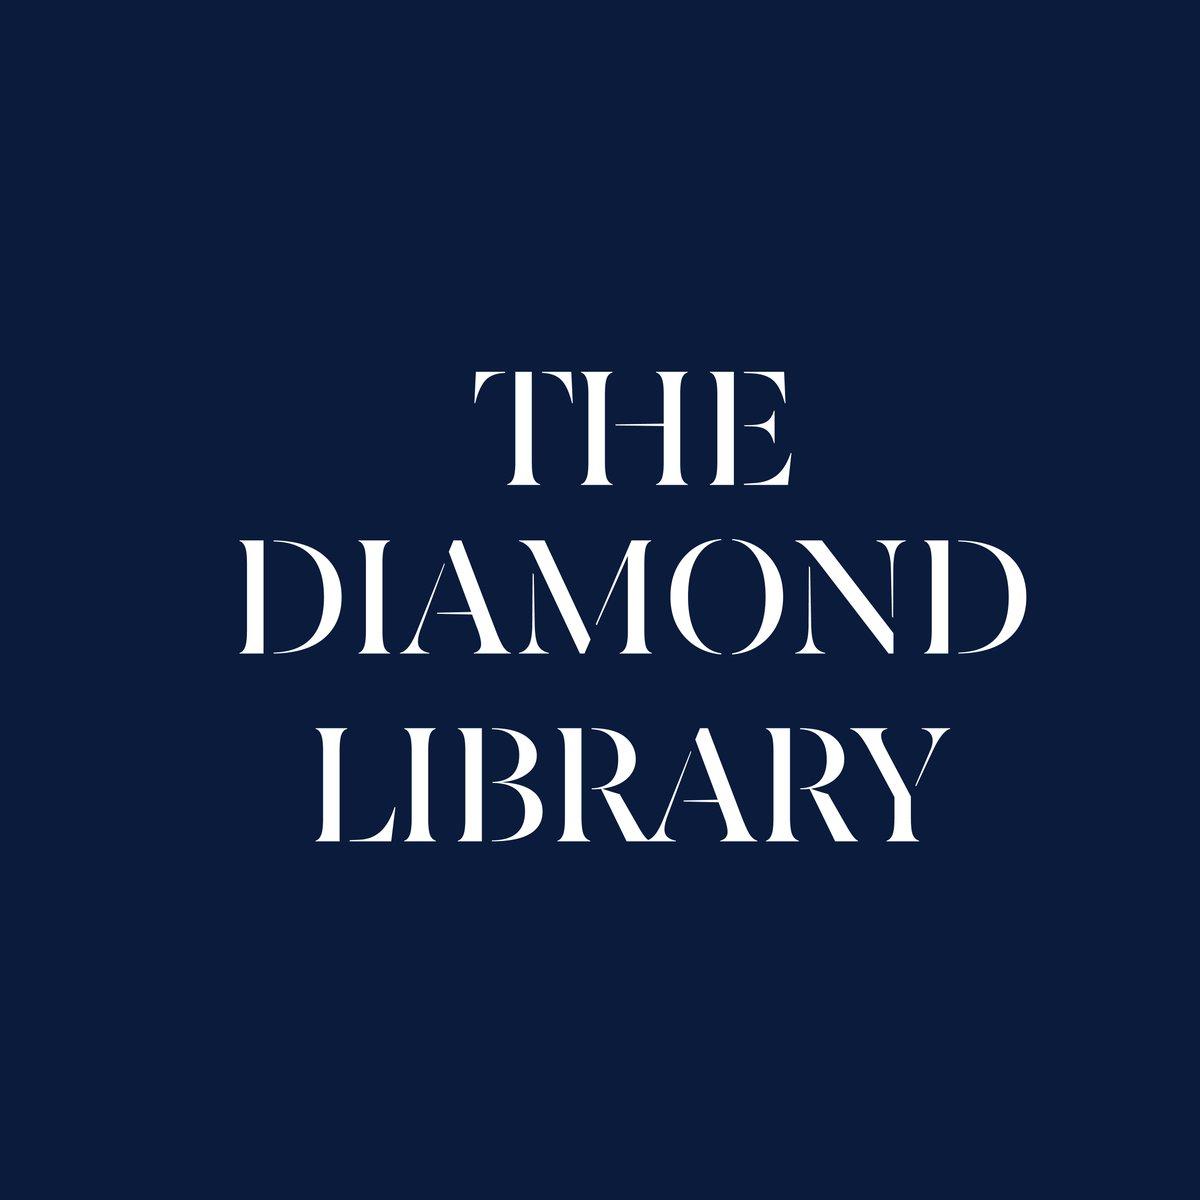 Our lab-grown diamonds score unbelievably high on the 4C scale. They're also unbelievably affordable as compared to mined diamonds.  #TDL #LabGrownDiamonds #Luxury #DiamondDetails #EngagementRing #WeddingInspo #Bride #CustomJewelry #Custom #FineJewelry #Diamonds #IDo #SheSaidYespic.twitter.com/22xtwnaXDI